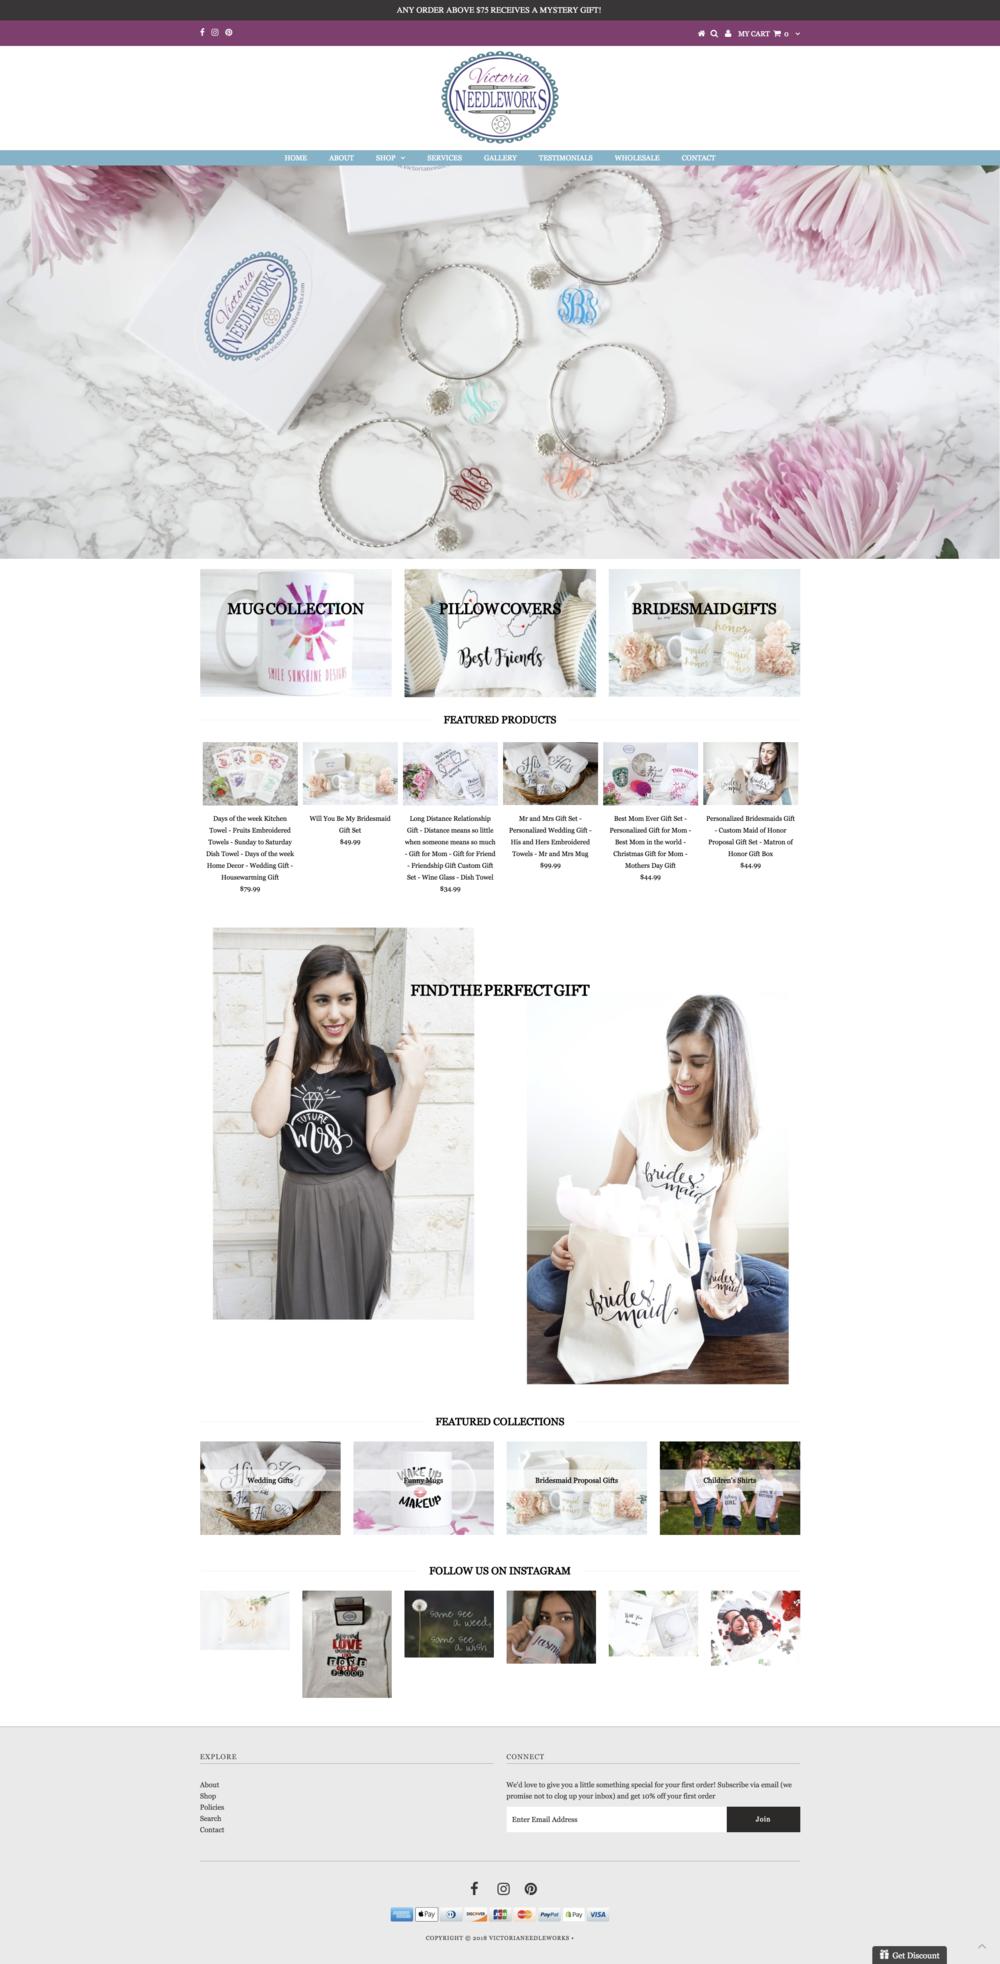 kristen-fulchi-design-studio-custom-shopify-website-design-victoria-needleworks-web-design-for-creatives.png